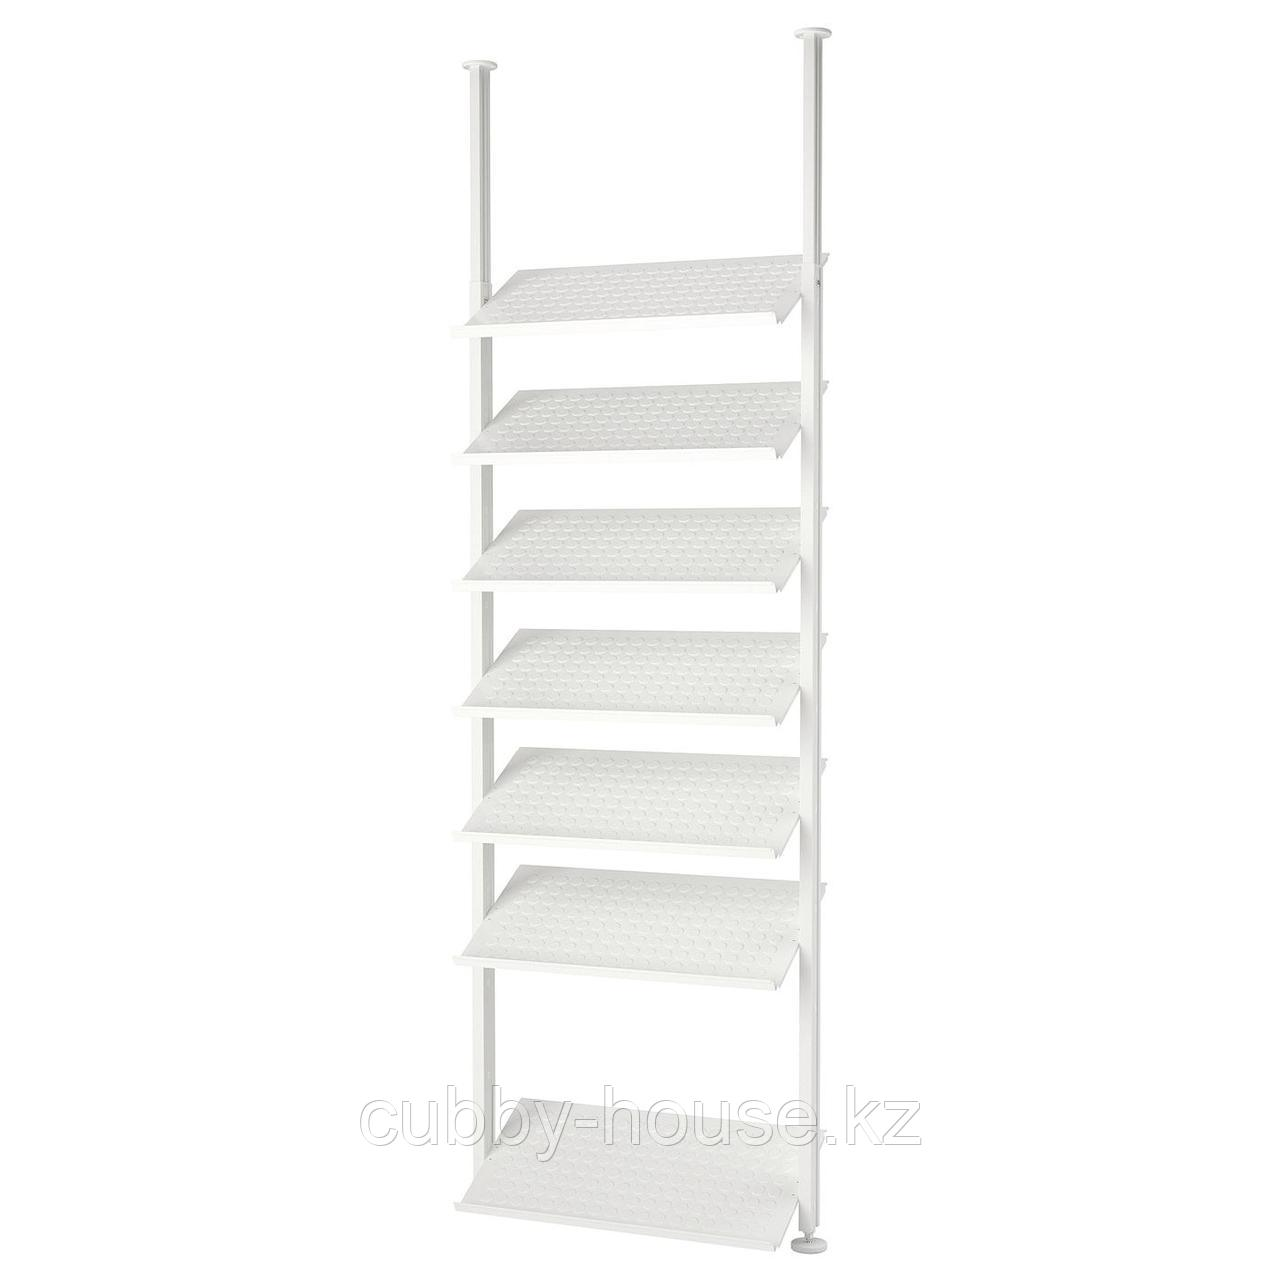 ЭЛВАРЛИ 1 секция, белый, 92x36x222-350 см